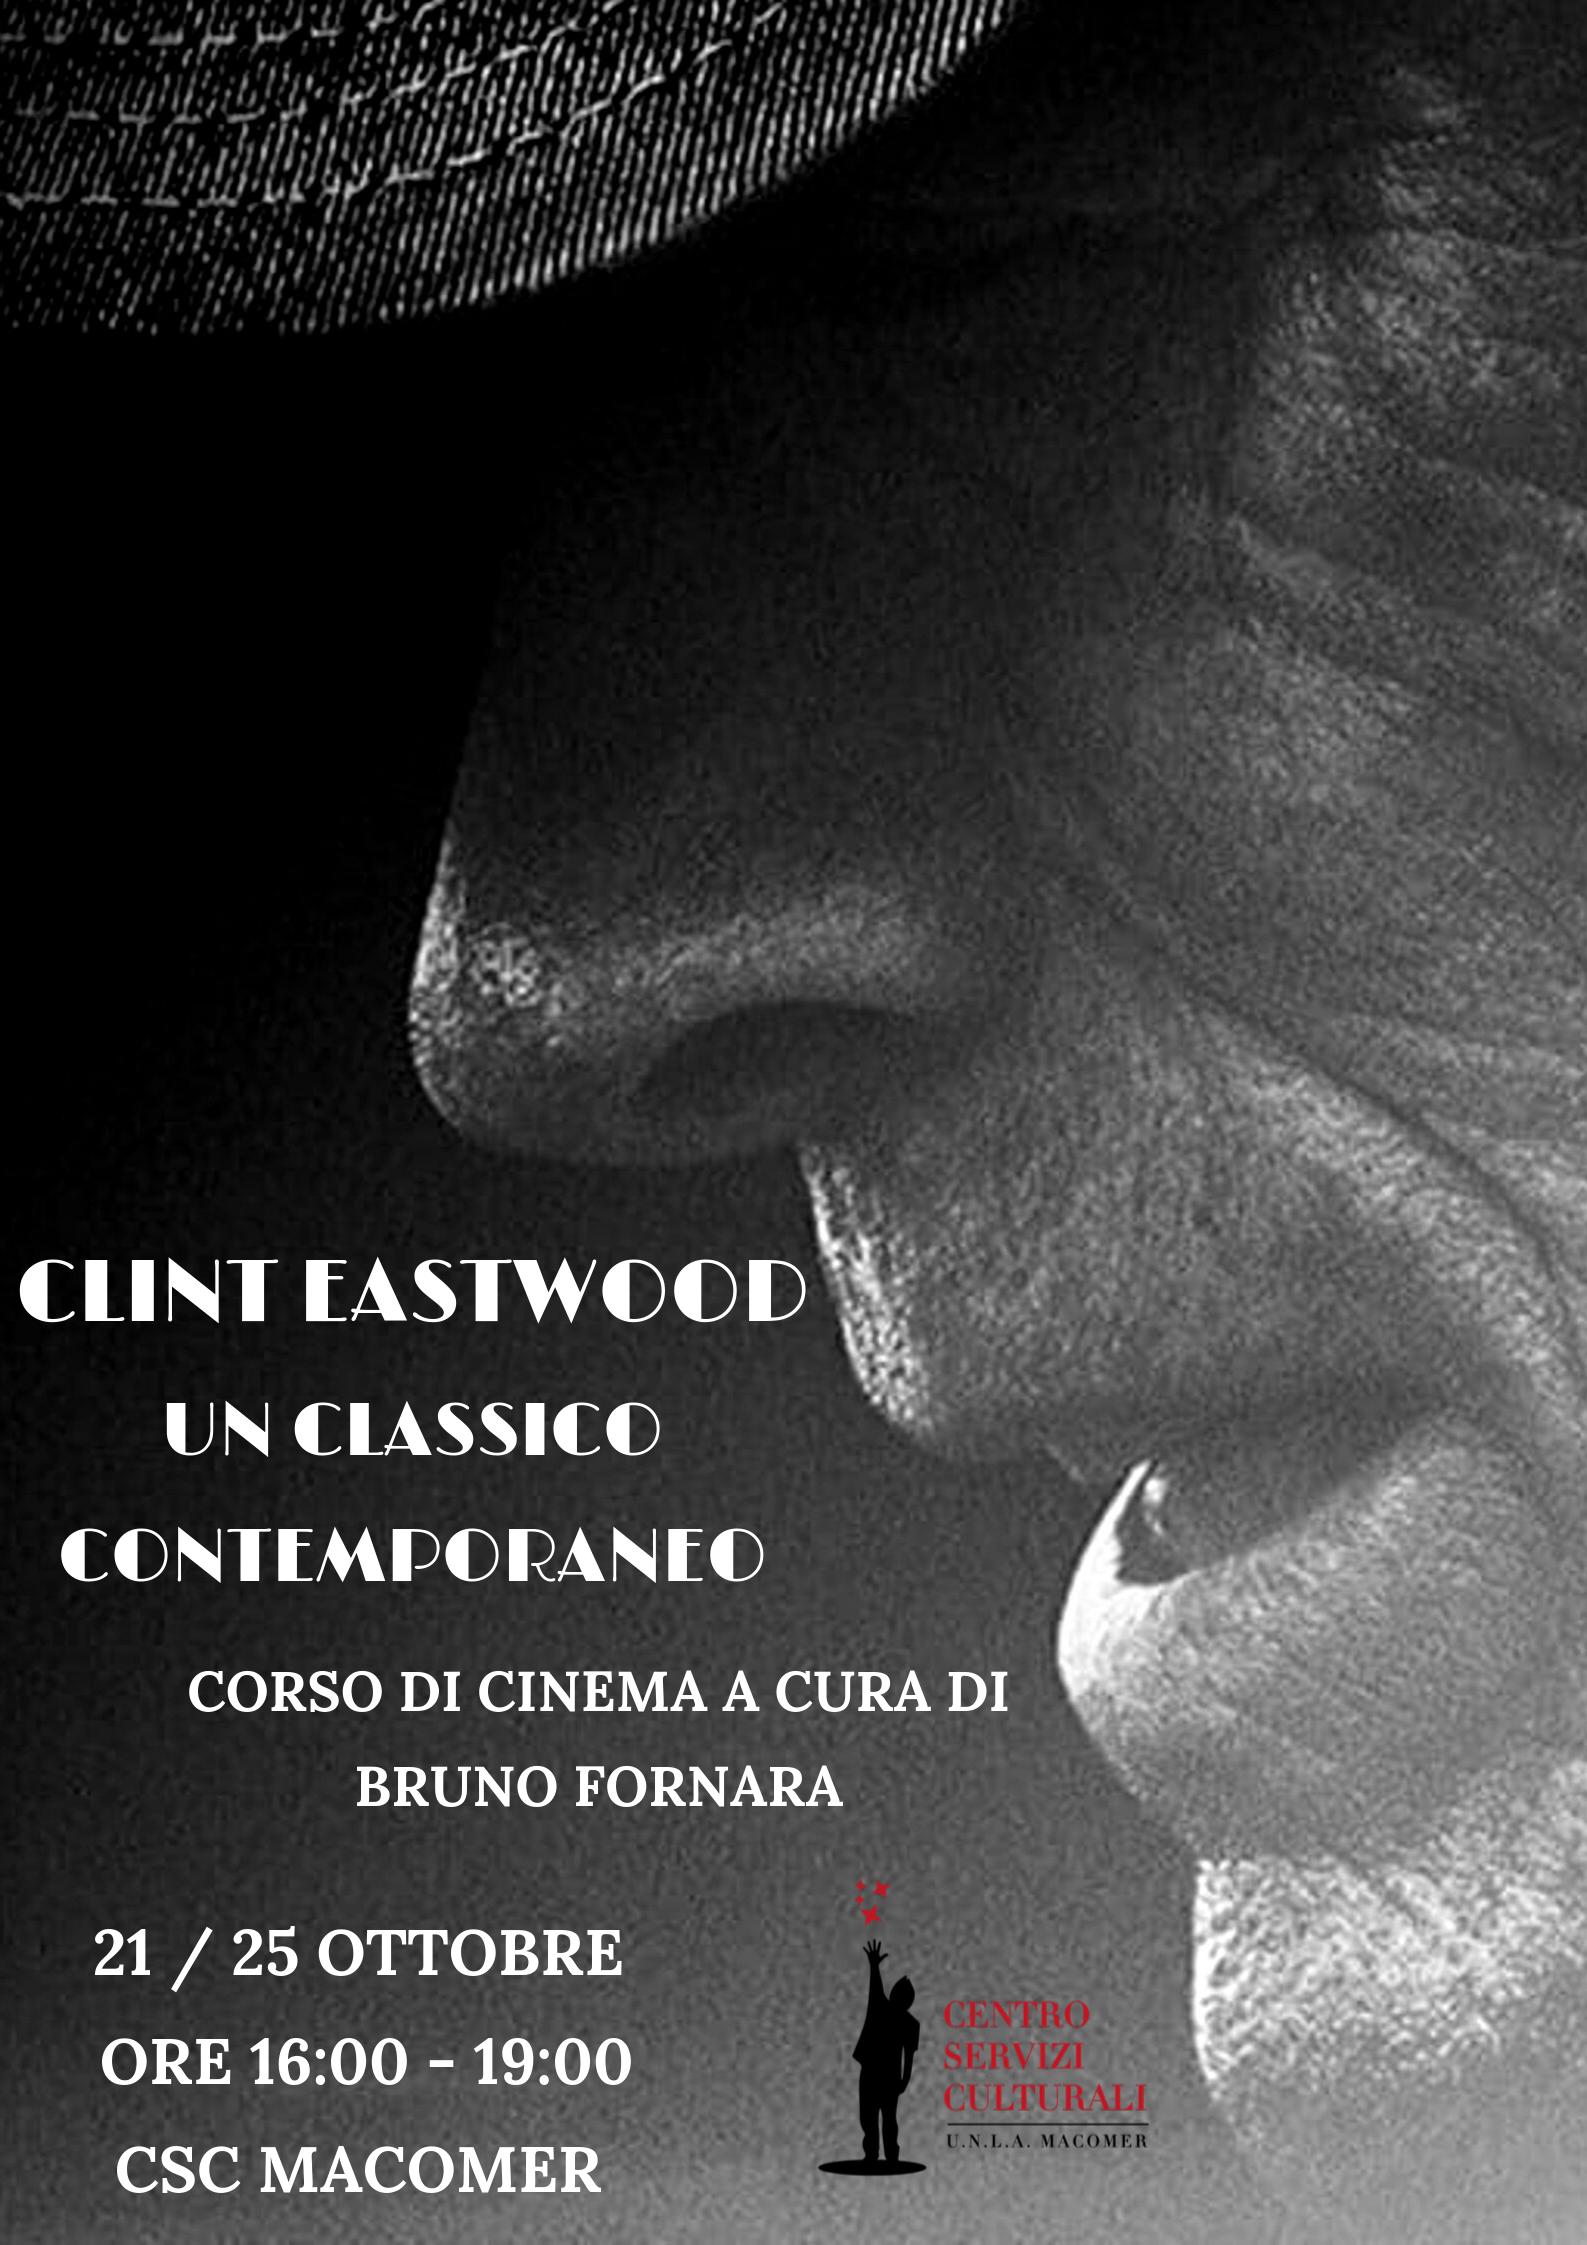 """Clint Eastwood. Un classico contemporaneo"" a cura di Bruno Fornara"